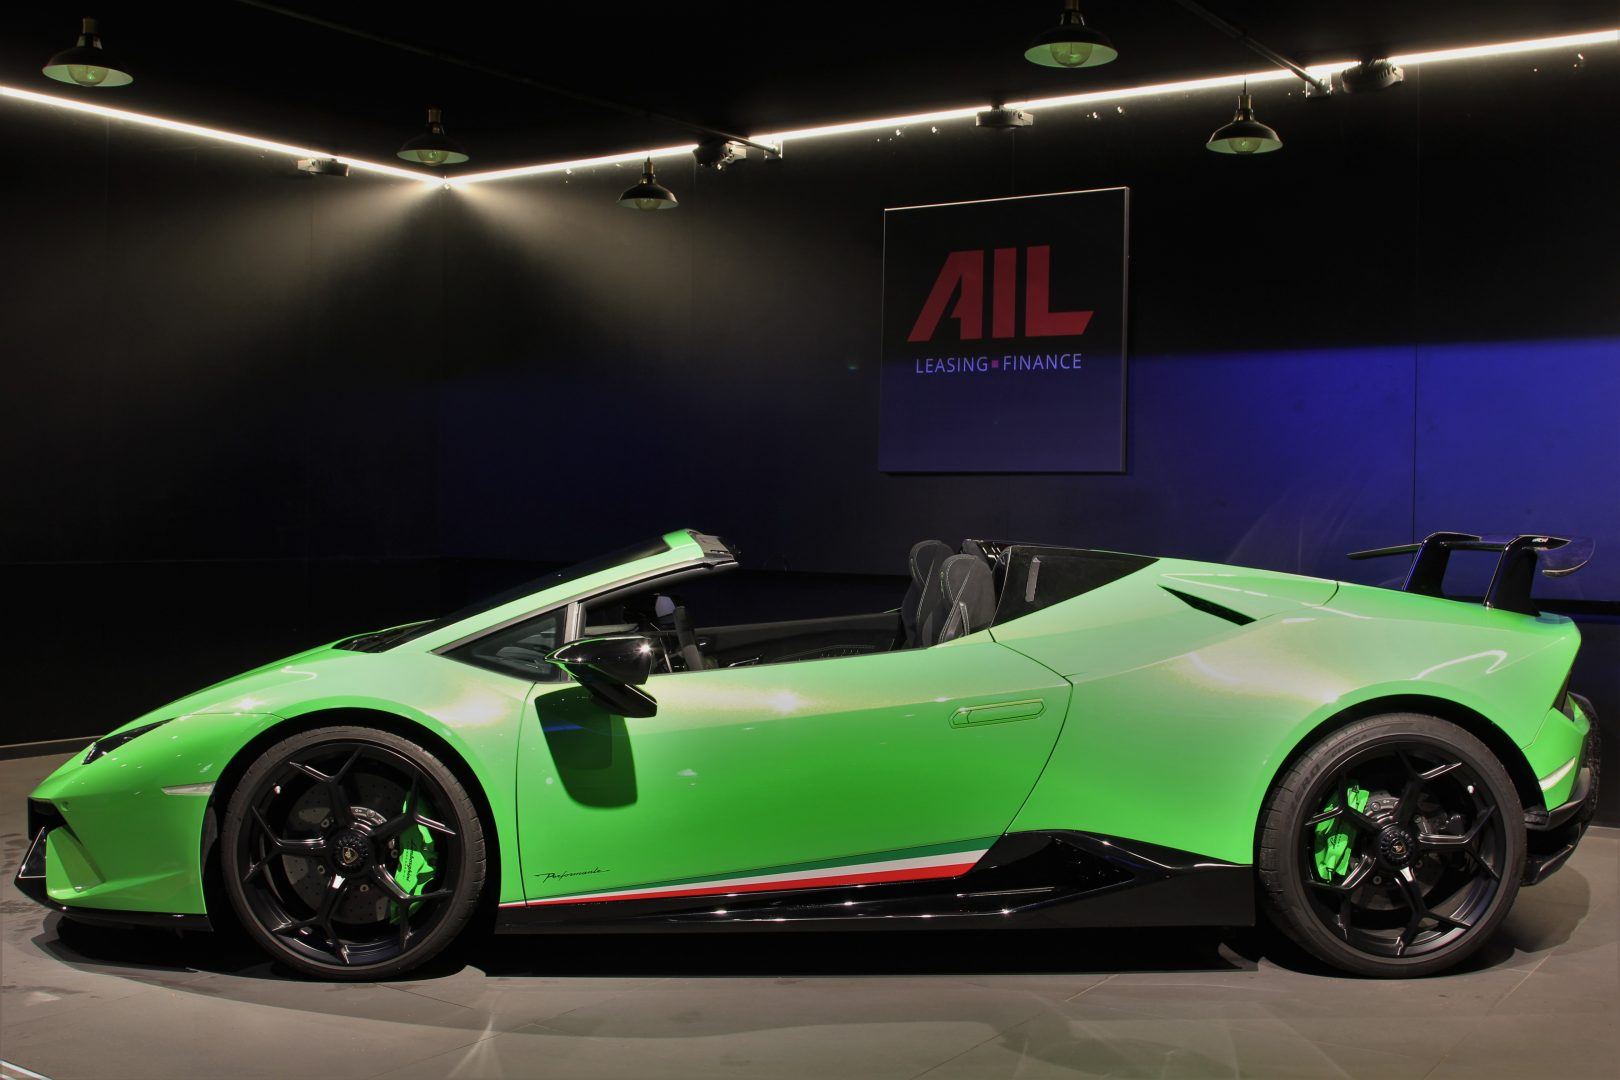 AIL Lamborghini Huracan Performante Spyder LP 640-4 Verda Mantis 11